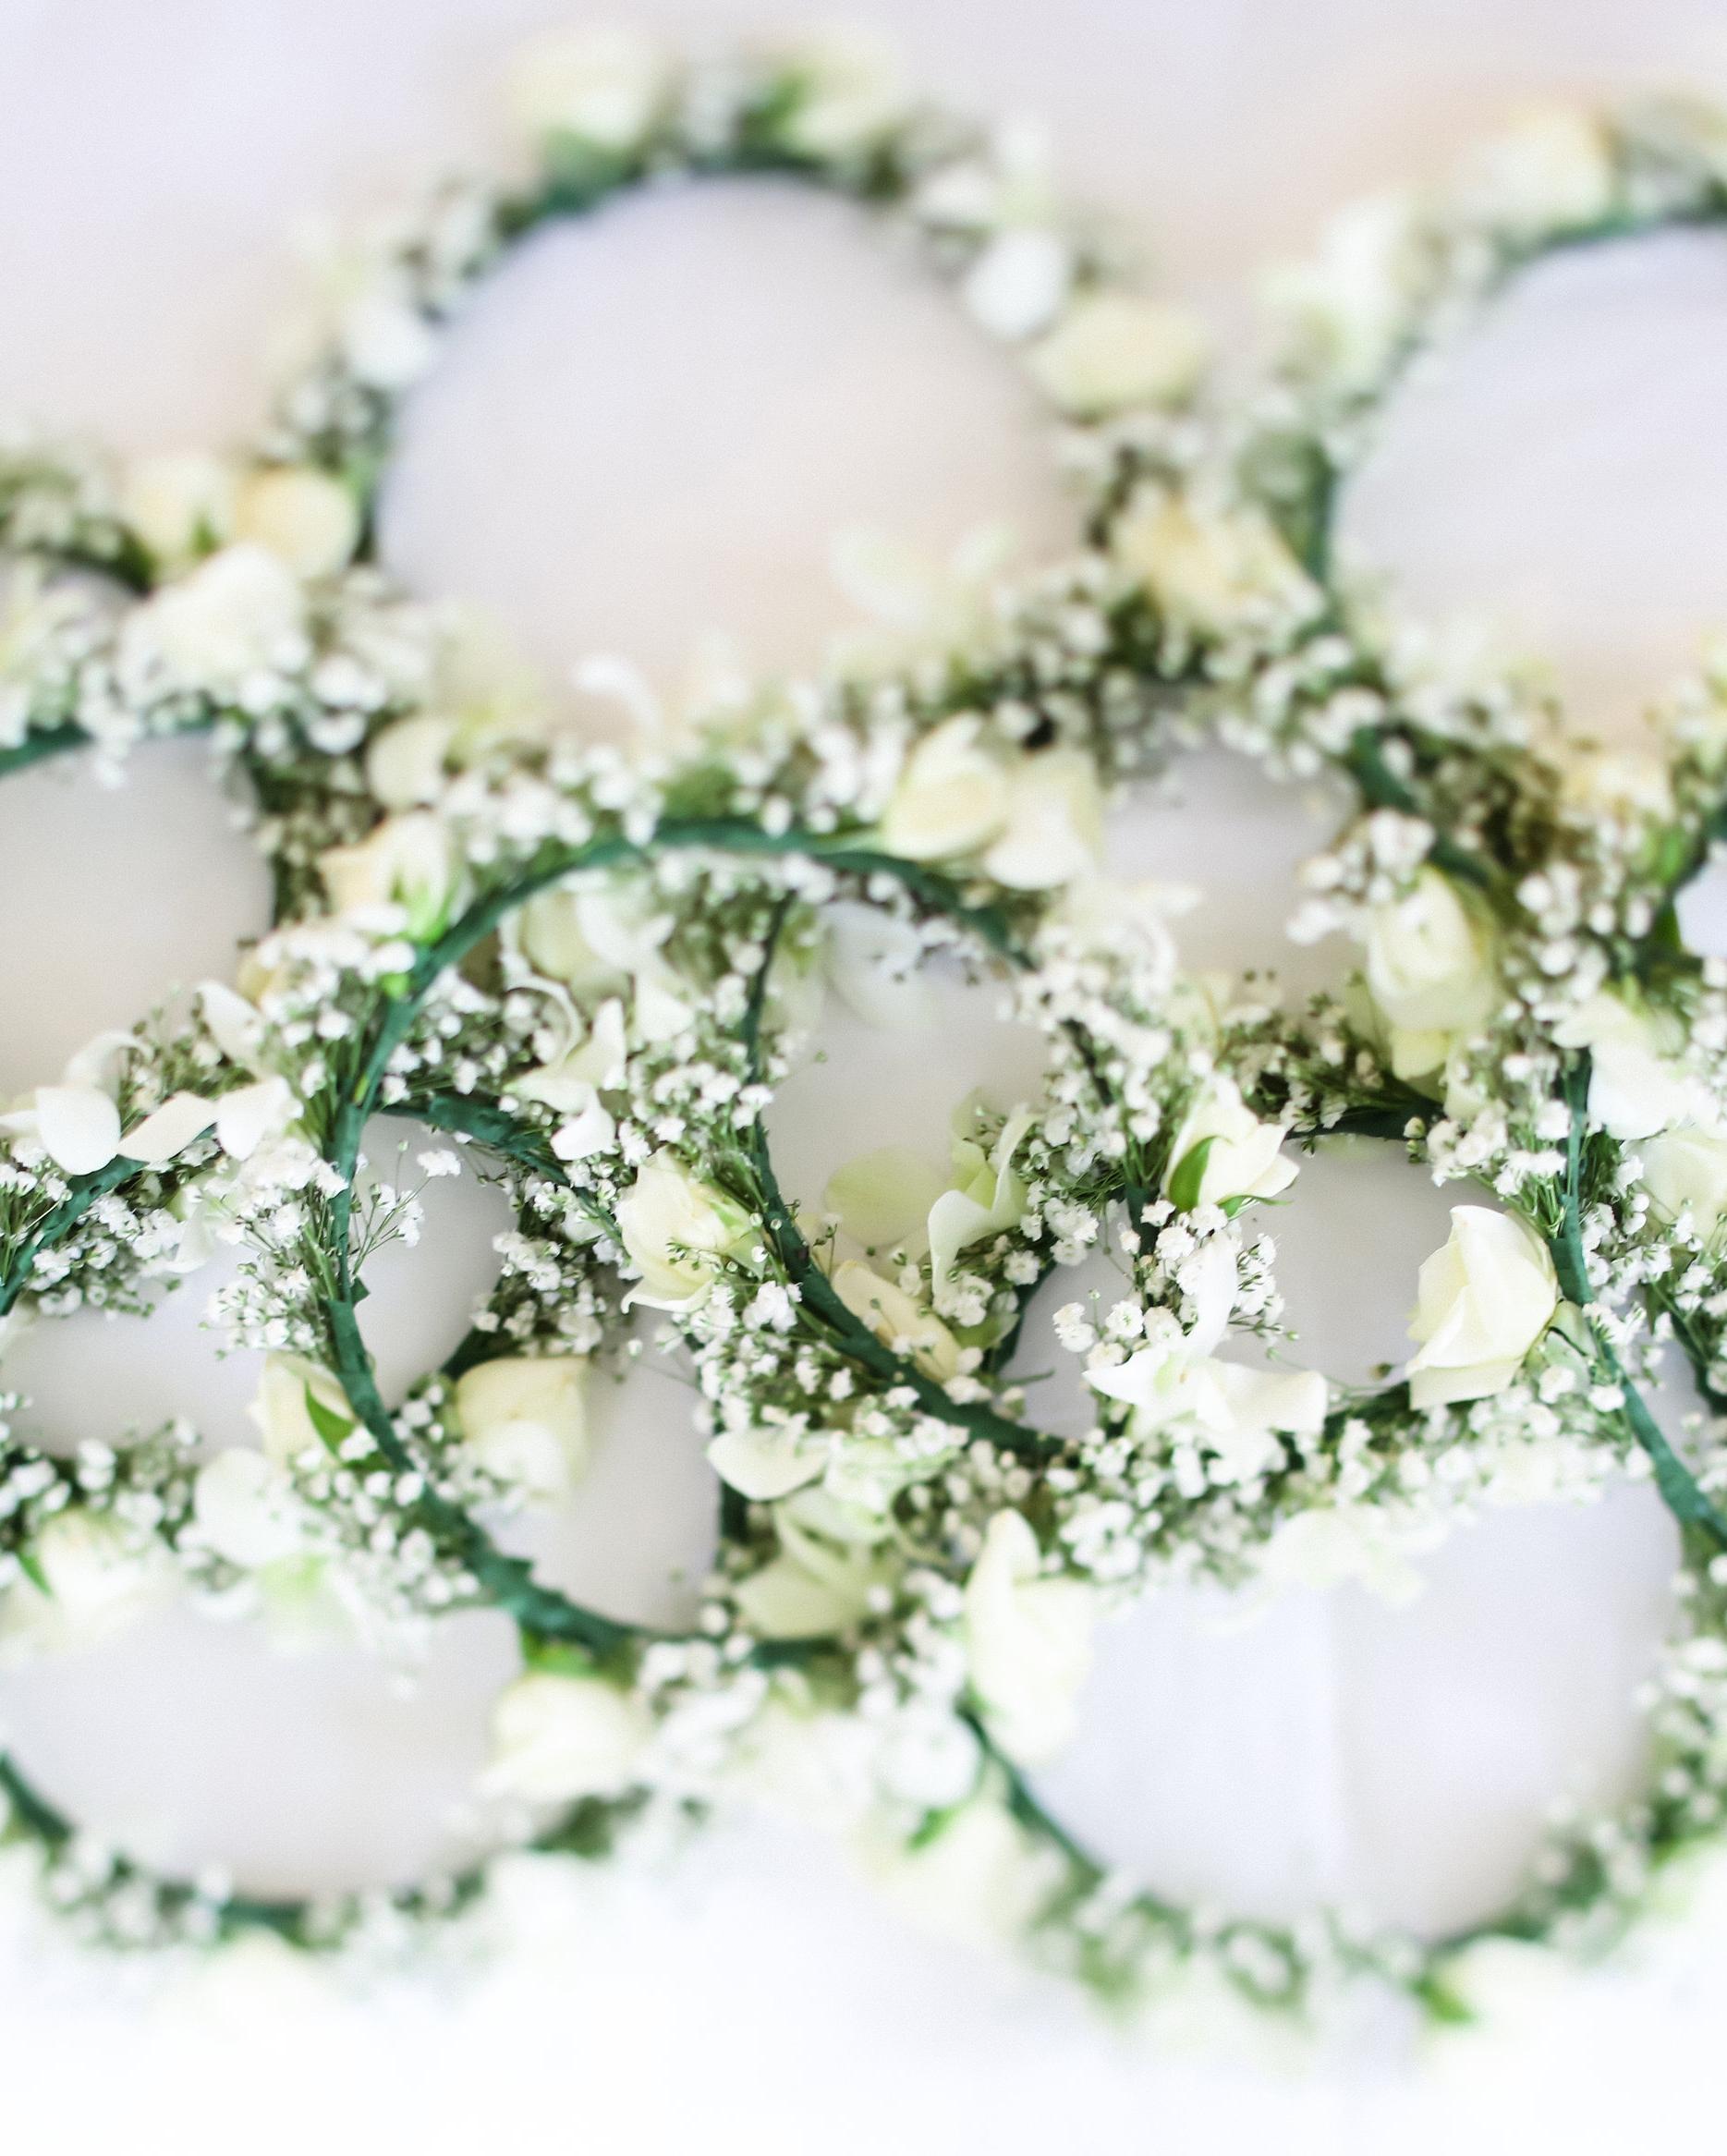 olivia-keith-wedding-accessories-24-s112304-0815.jpg